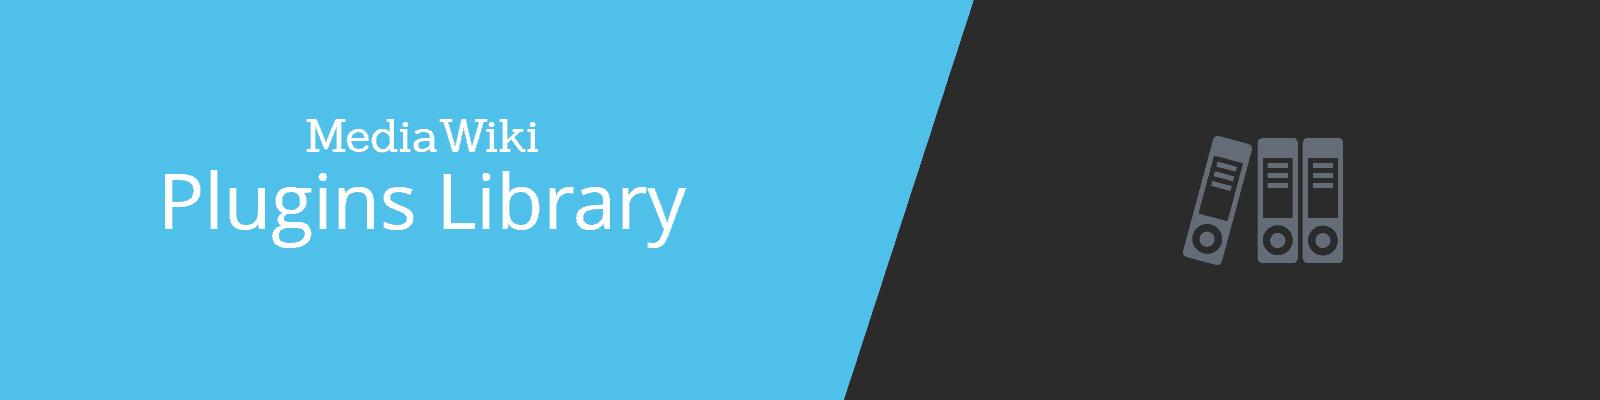 MediaWiki Plugins Library